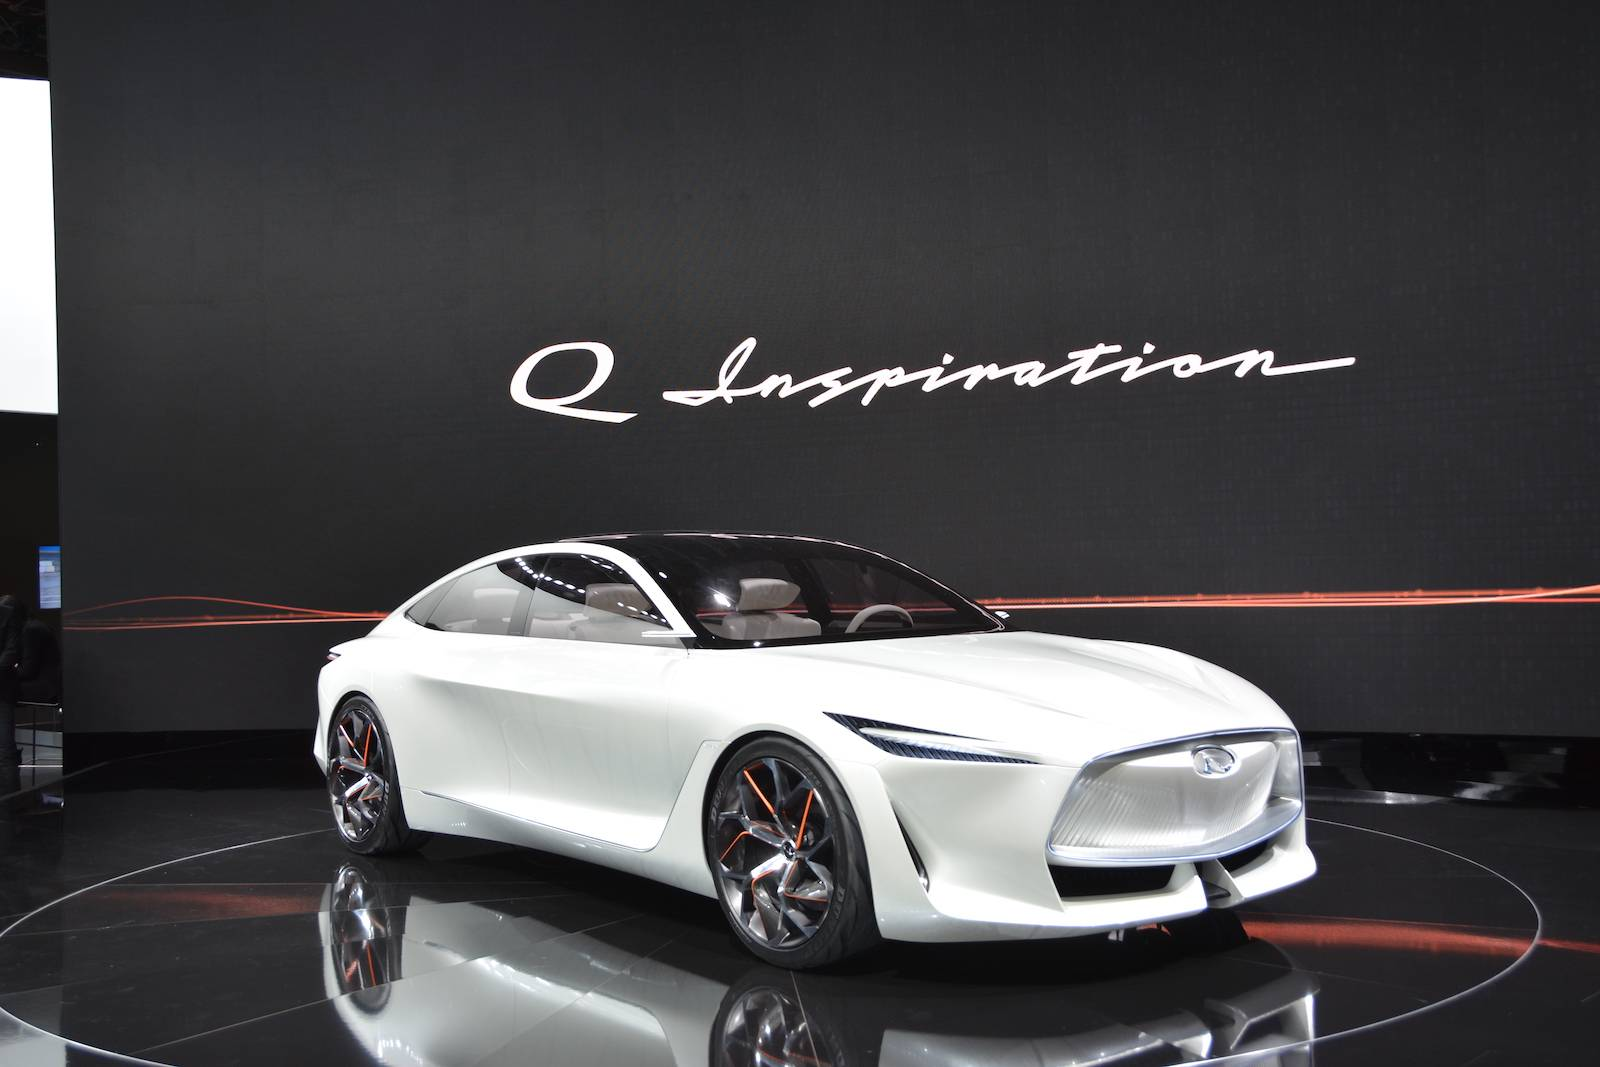 Infiniti infiniti concept car : Detroit 2018: Infiniti Q Inspiration Concept - GTspirit